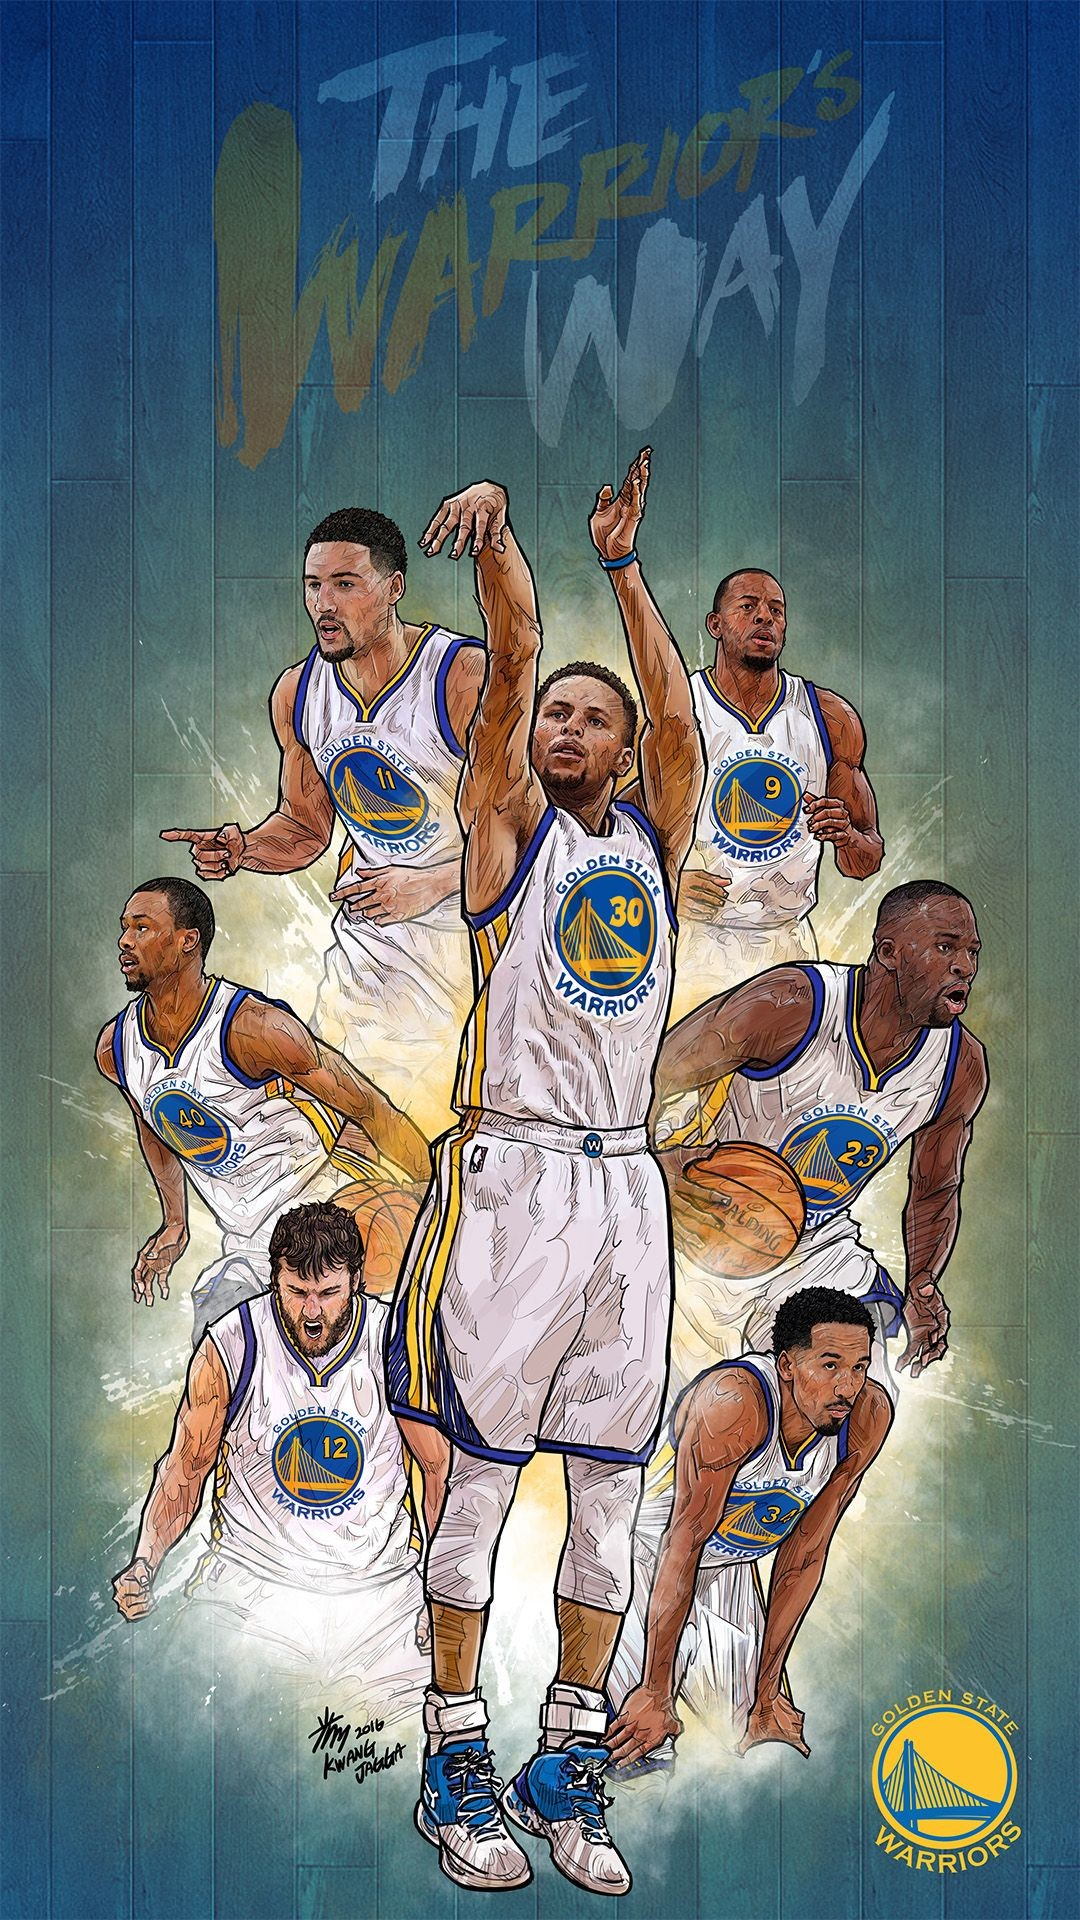 Res: 1080x1920, NBA Phone Wallpaper - Artist: Kim MinSuk (김민석) #Yellowmenace #basketballart  #